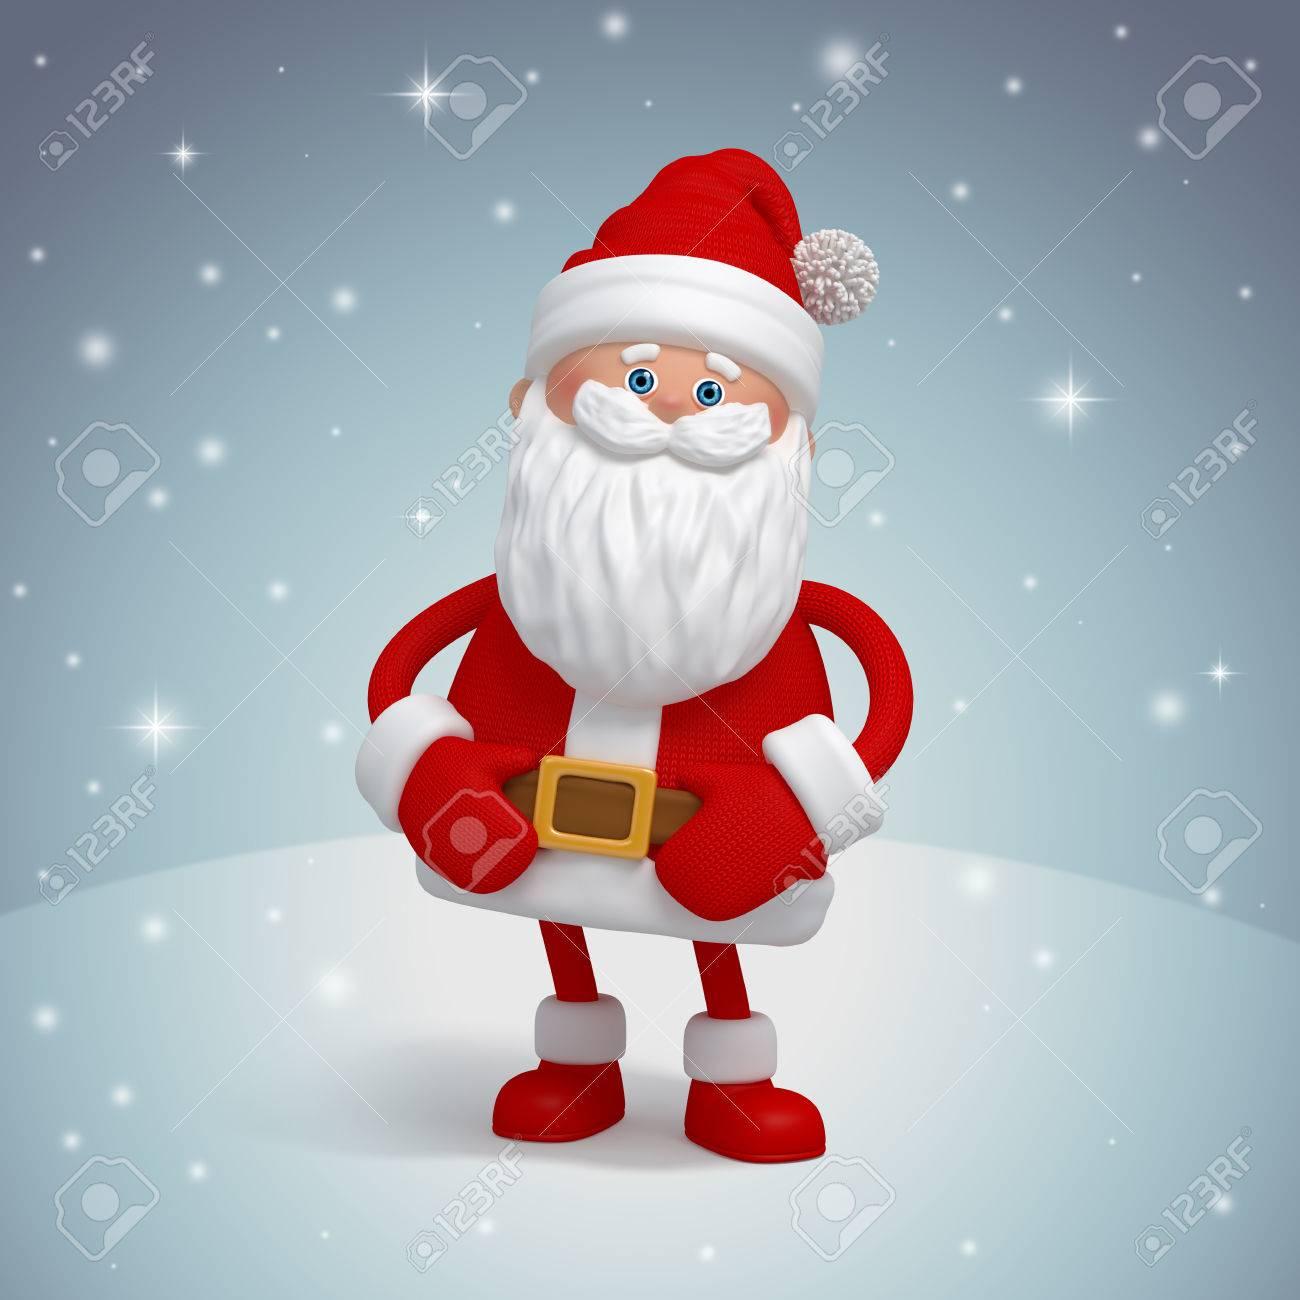 Santa claus greeting card 3d cartoon character clip art stock photo santa claus greeting card 3d cartoon character clip art stock photo 23973105 m4hsunfo